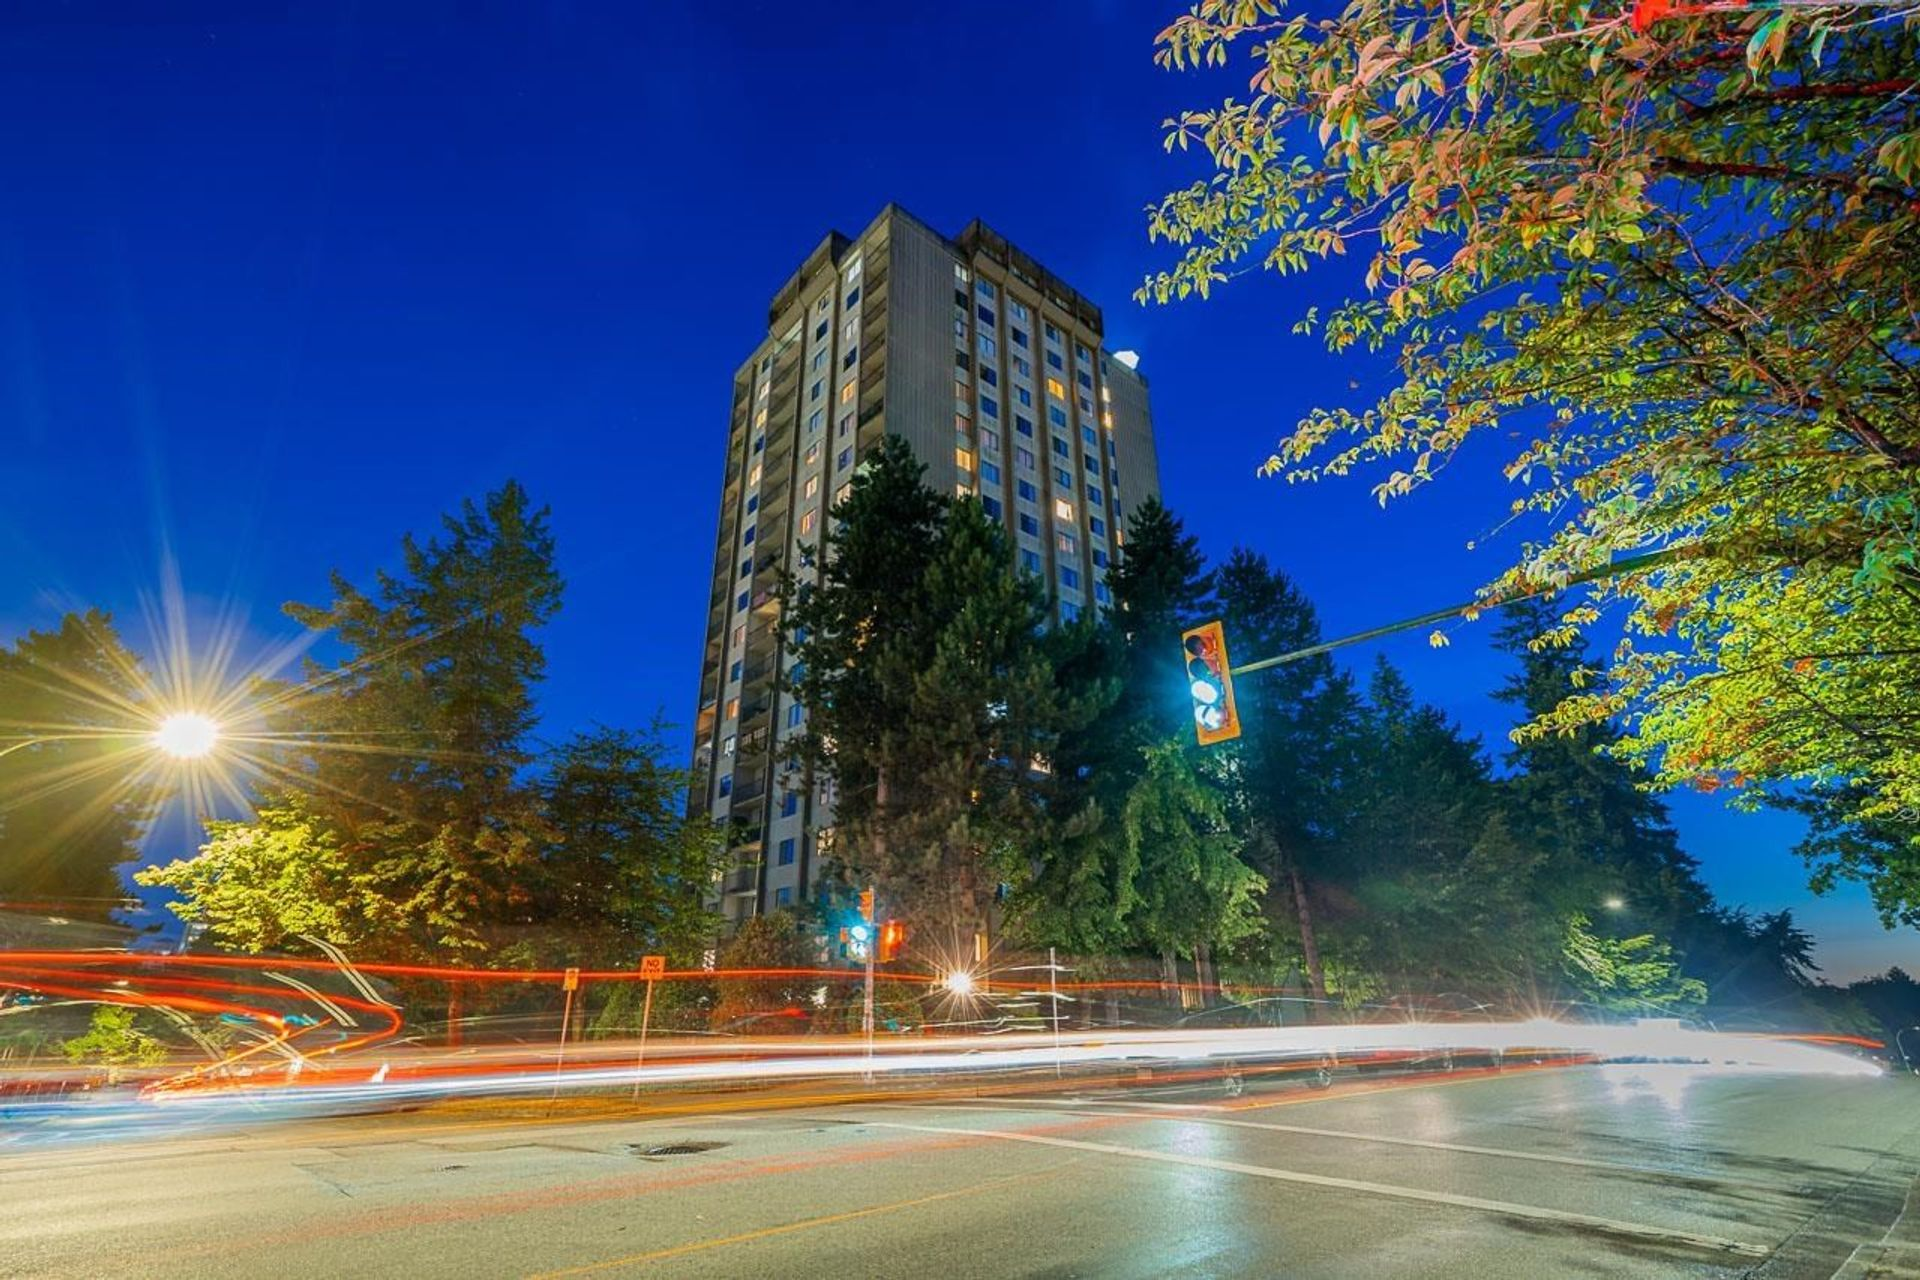 9595-erickson-drive-sullivan-heights-burnaby-north-18 at 1106 - 9595 Erickson Drive, Sullivan Heights, Burnaby North